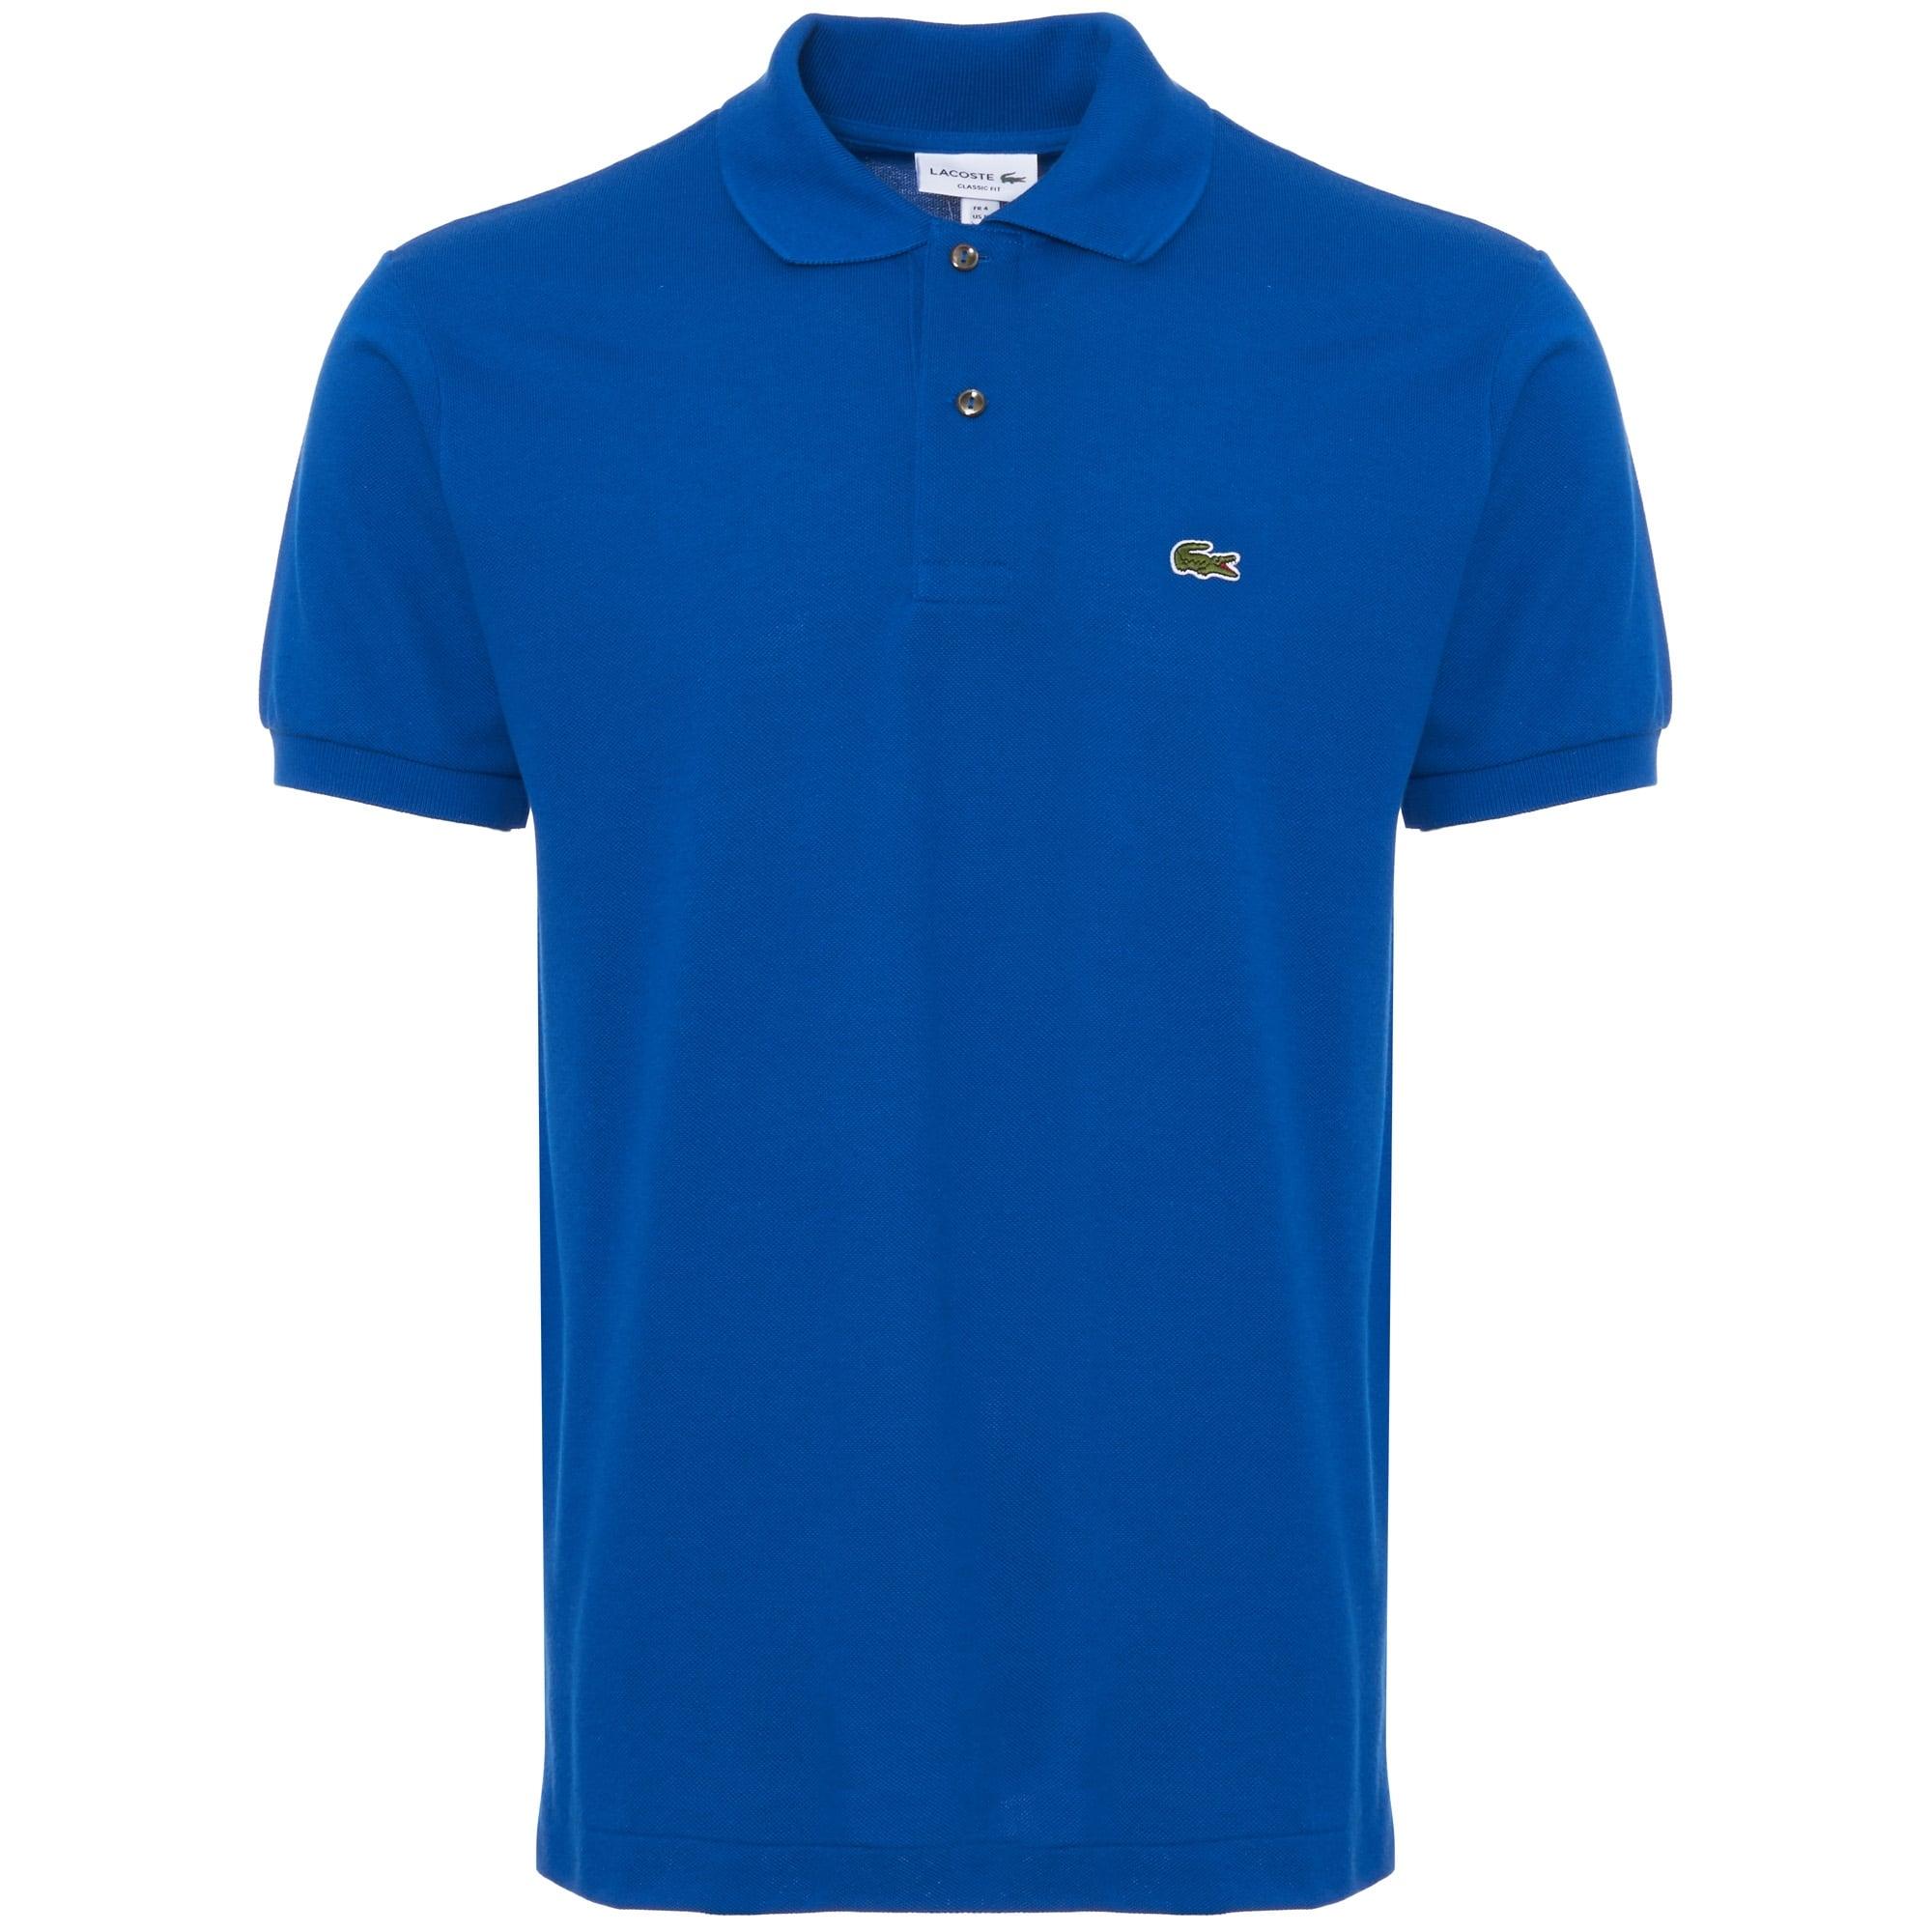 514dfb8a Lacoste Electrique L.12.12 Short Sleeved Polo Shirt